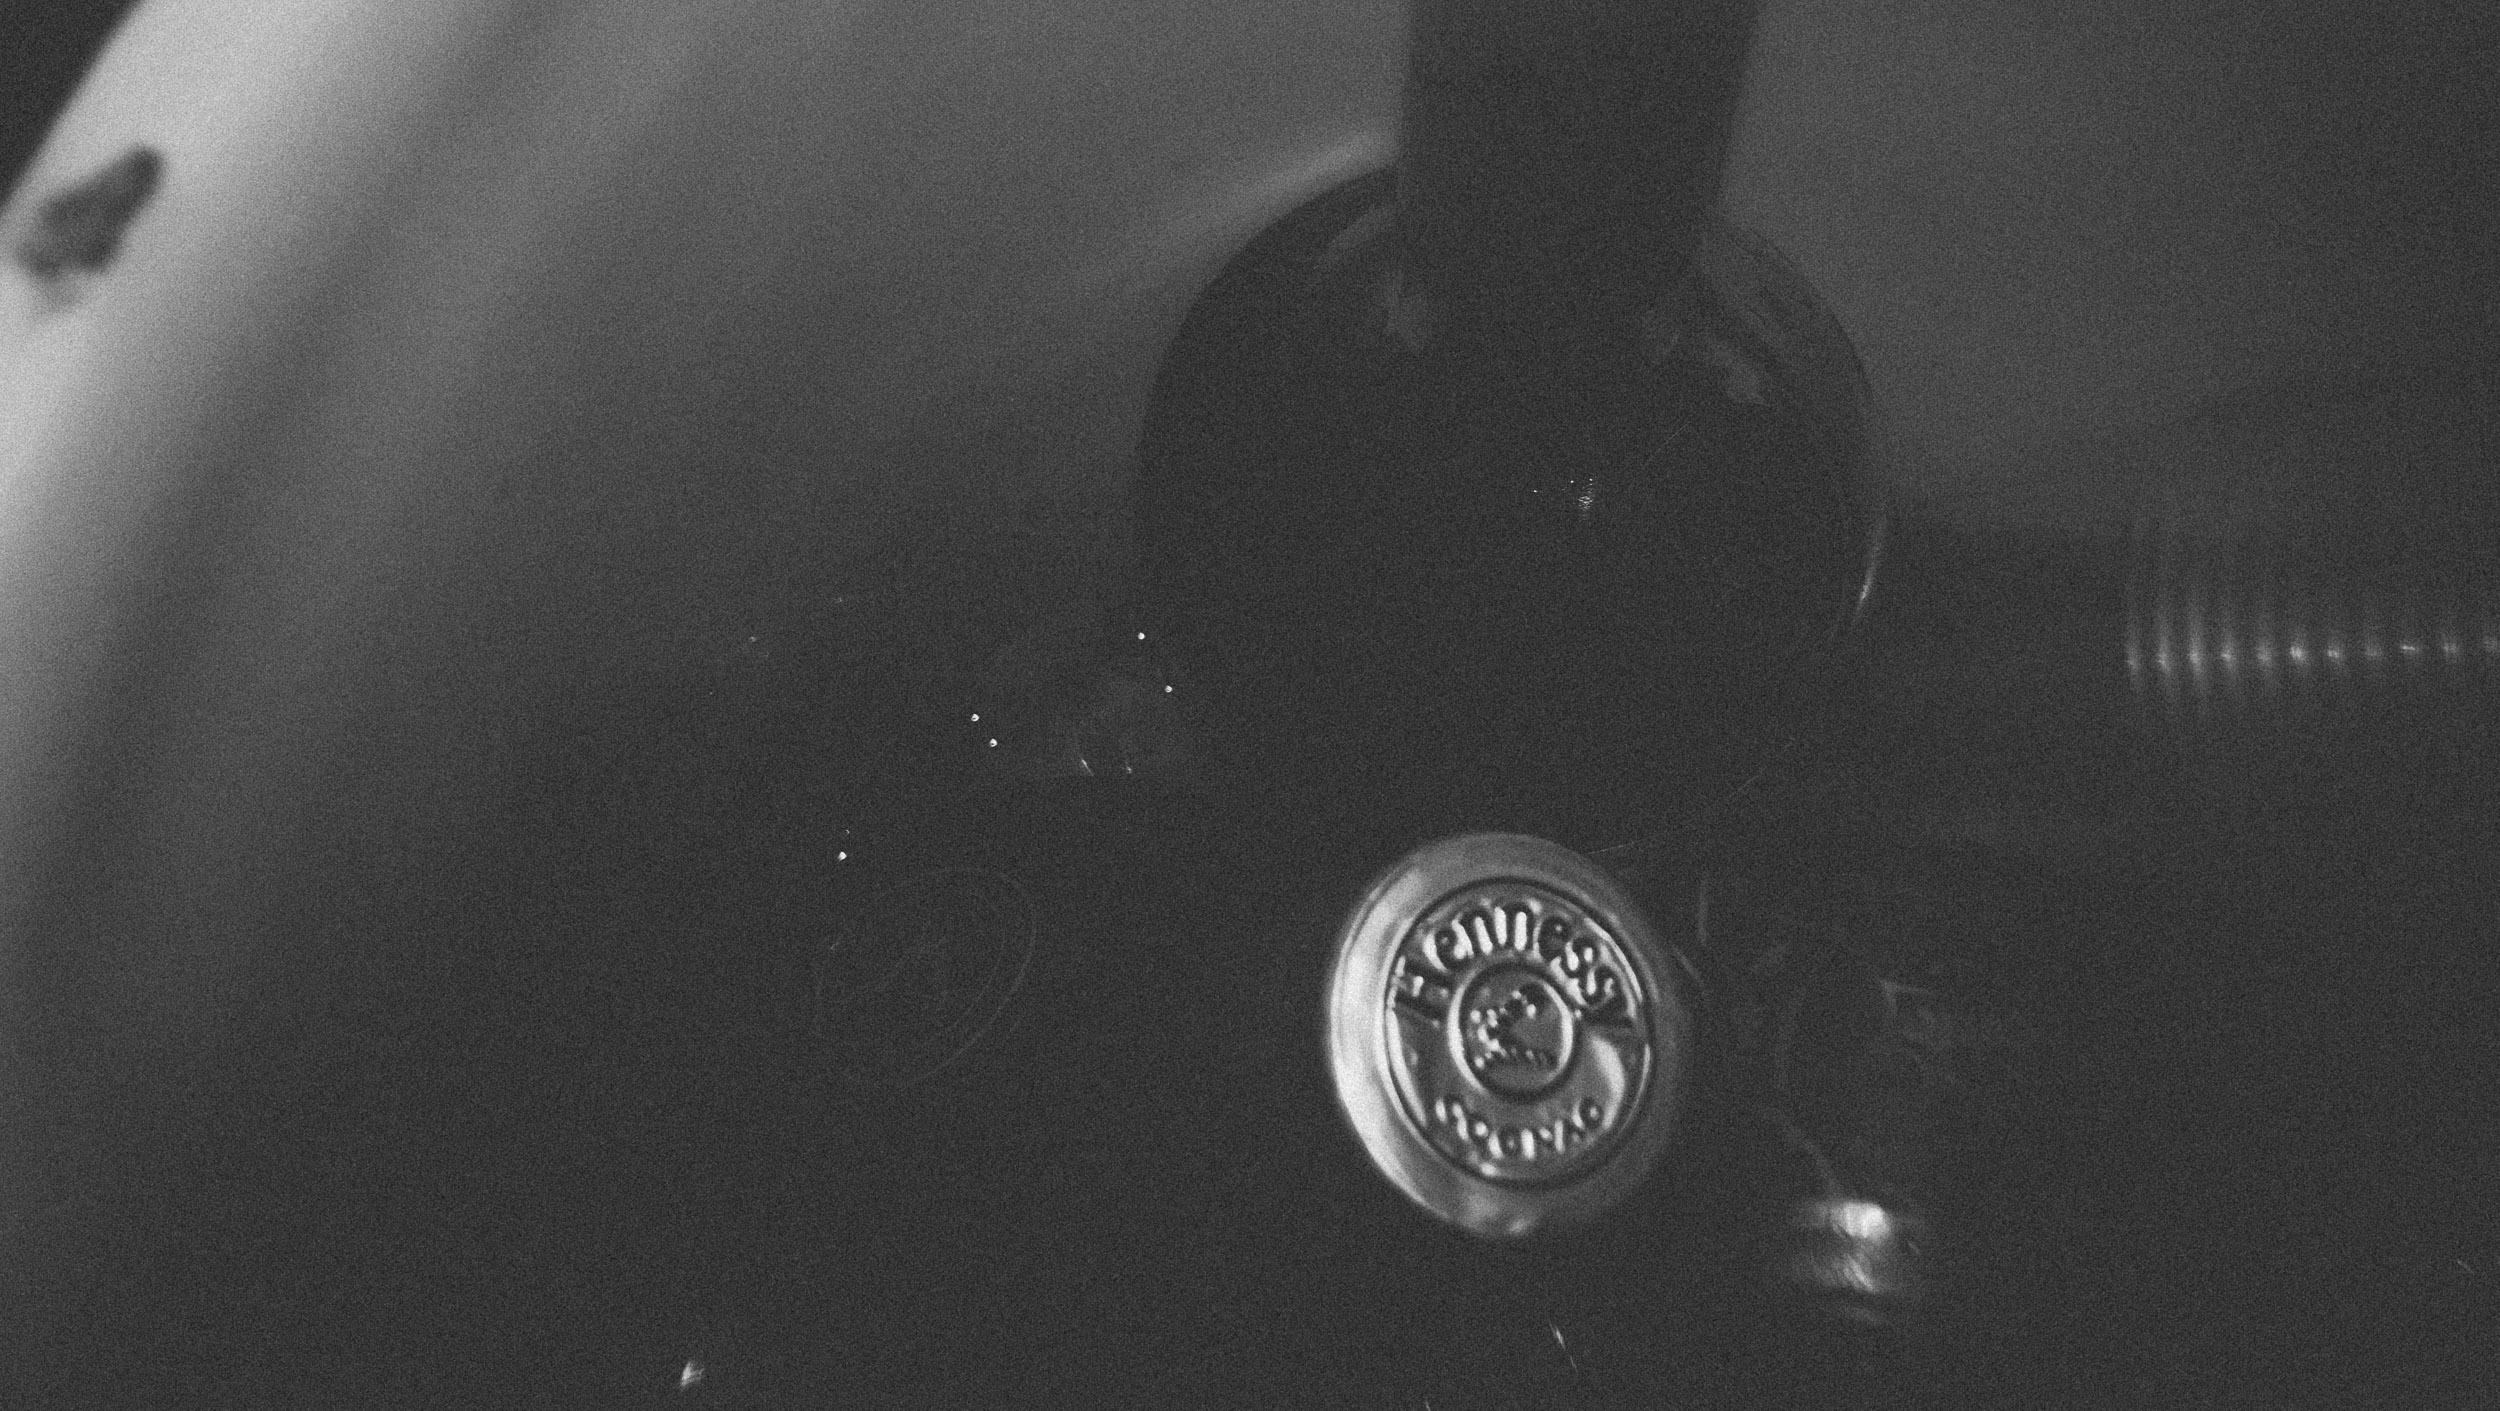 film-archive-kc.locke-82-32.jpg